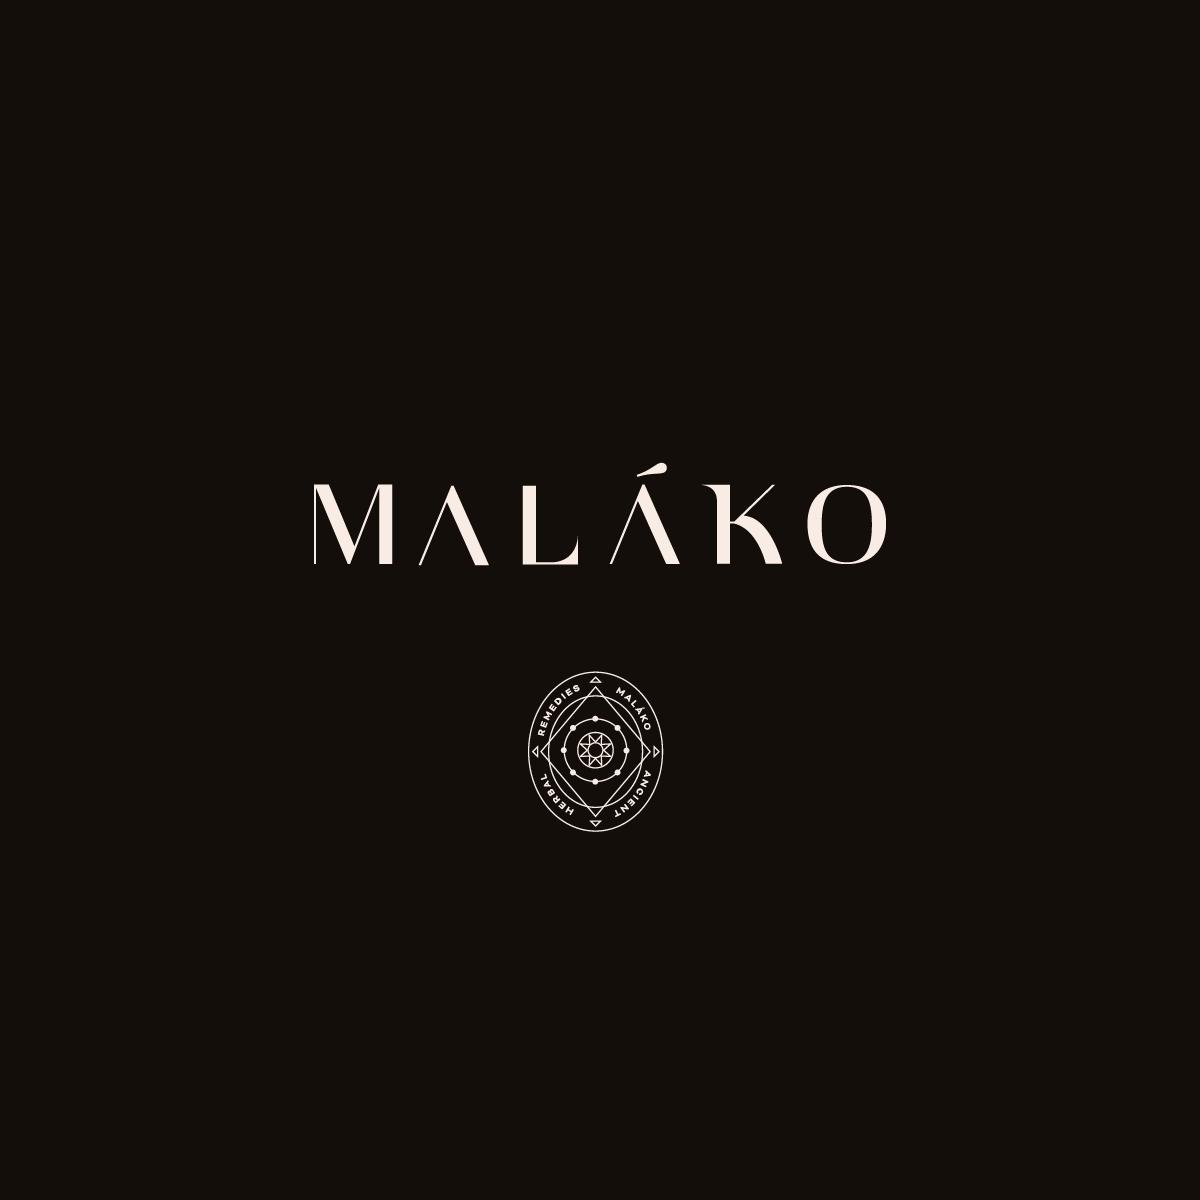 Malako-skincare-logo-design-loolaa-designs-2.png